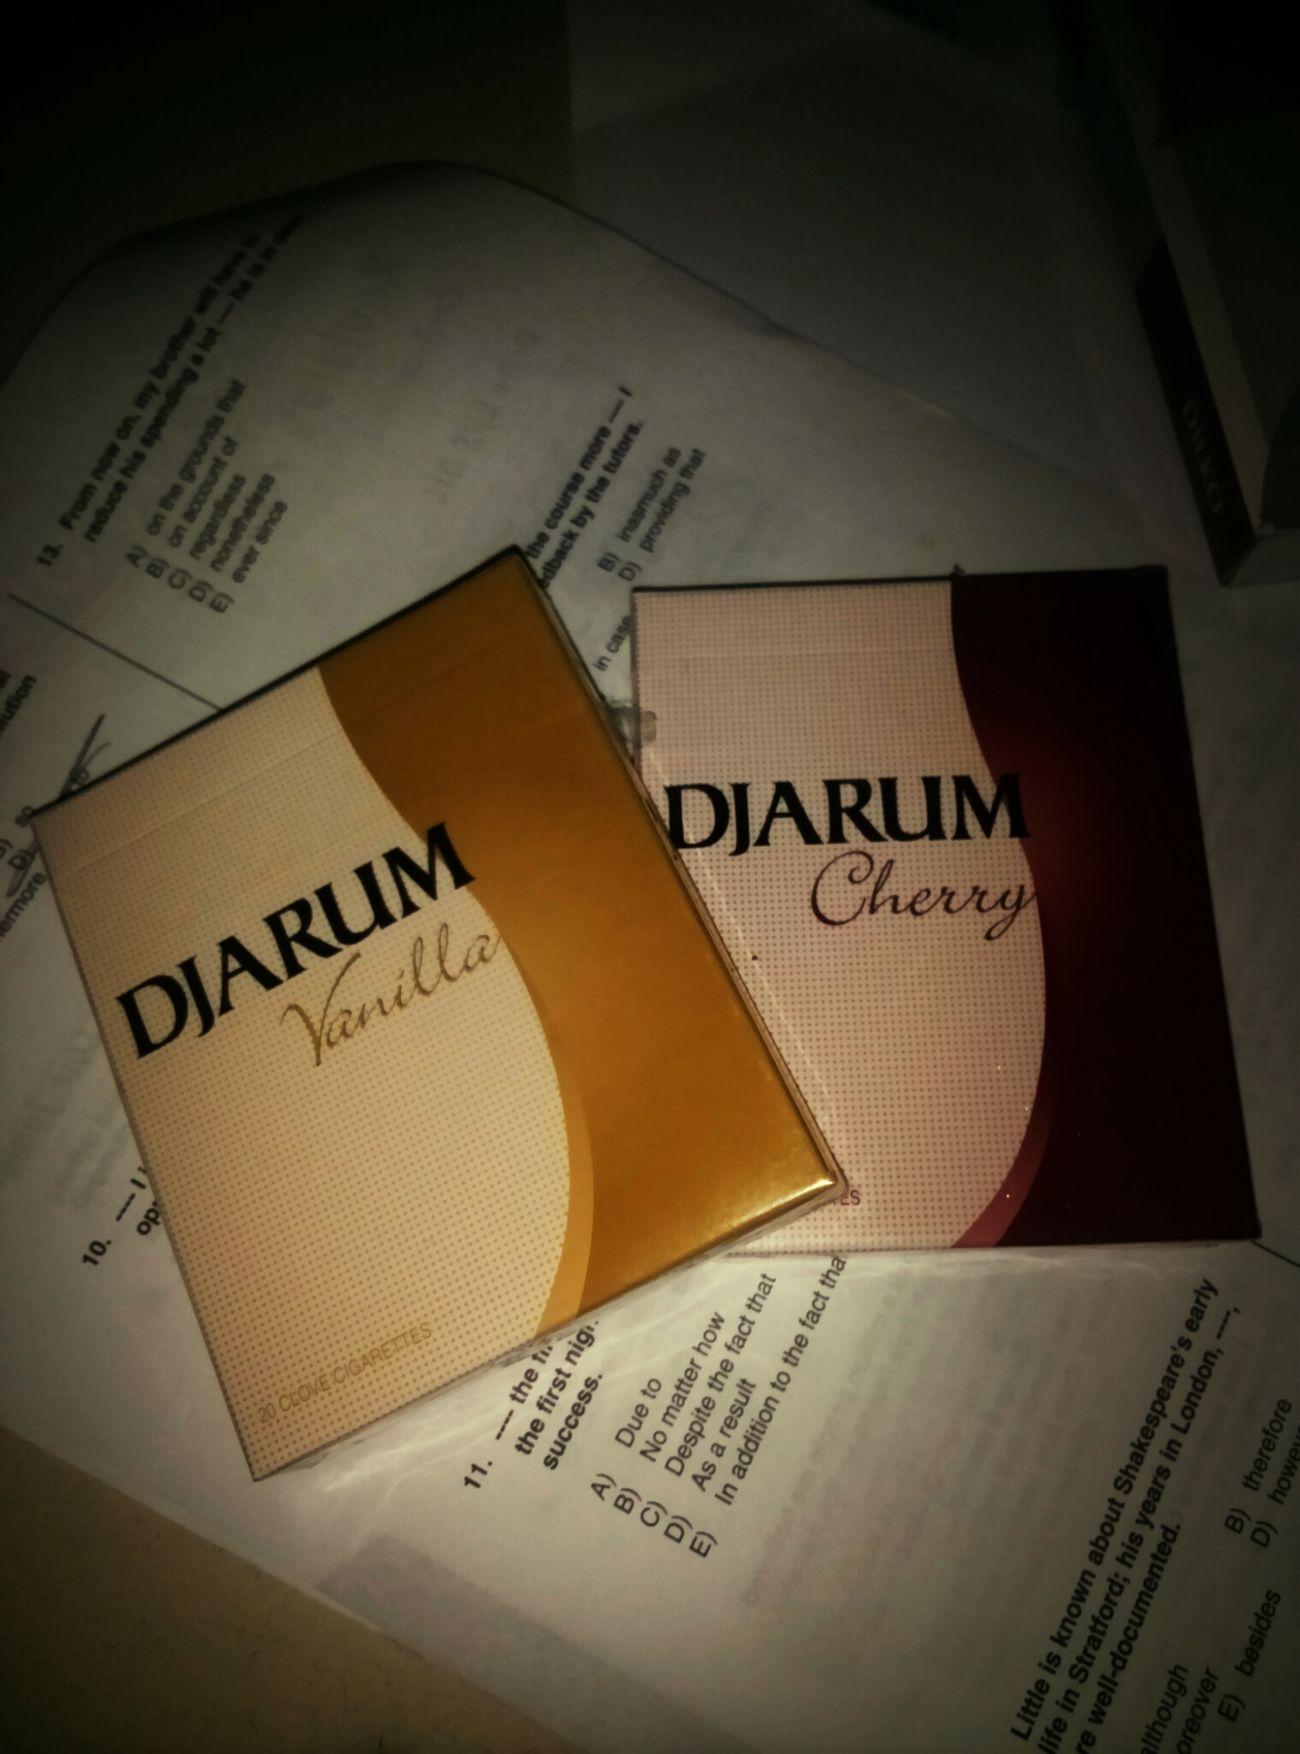 Djarum Cigarette Time Vanilla Cherry